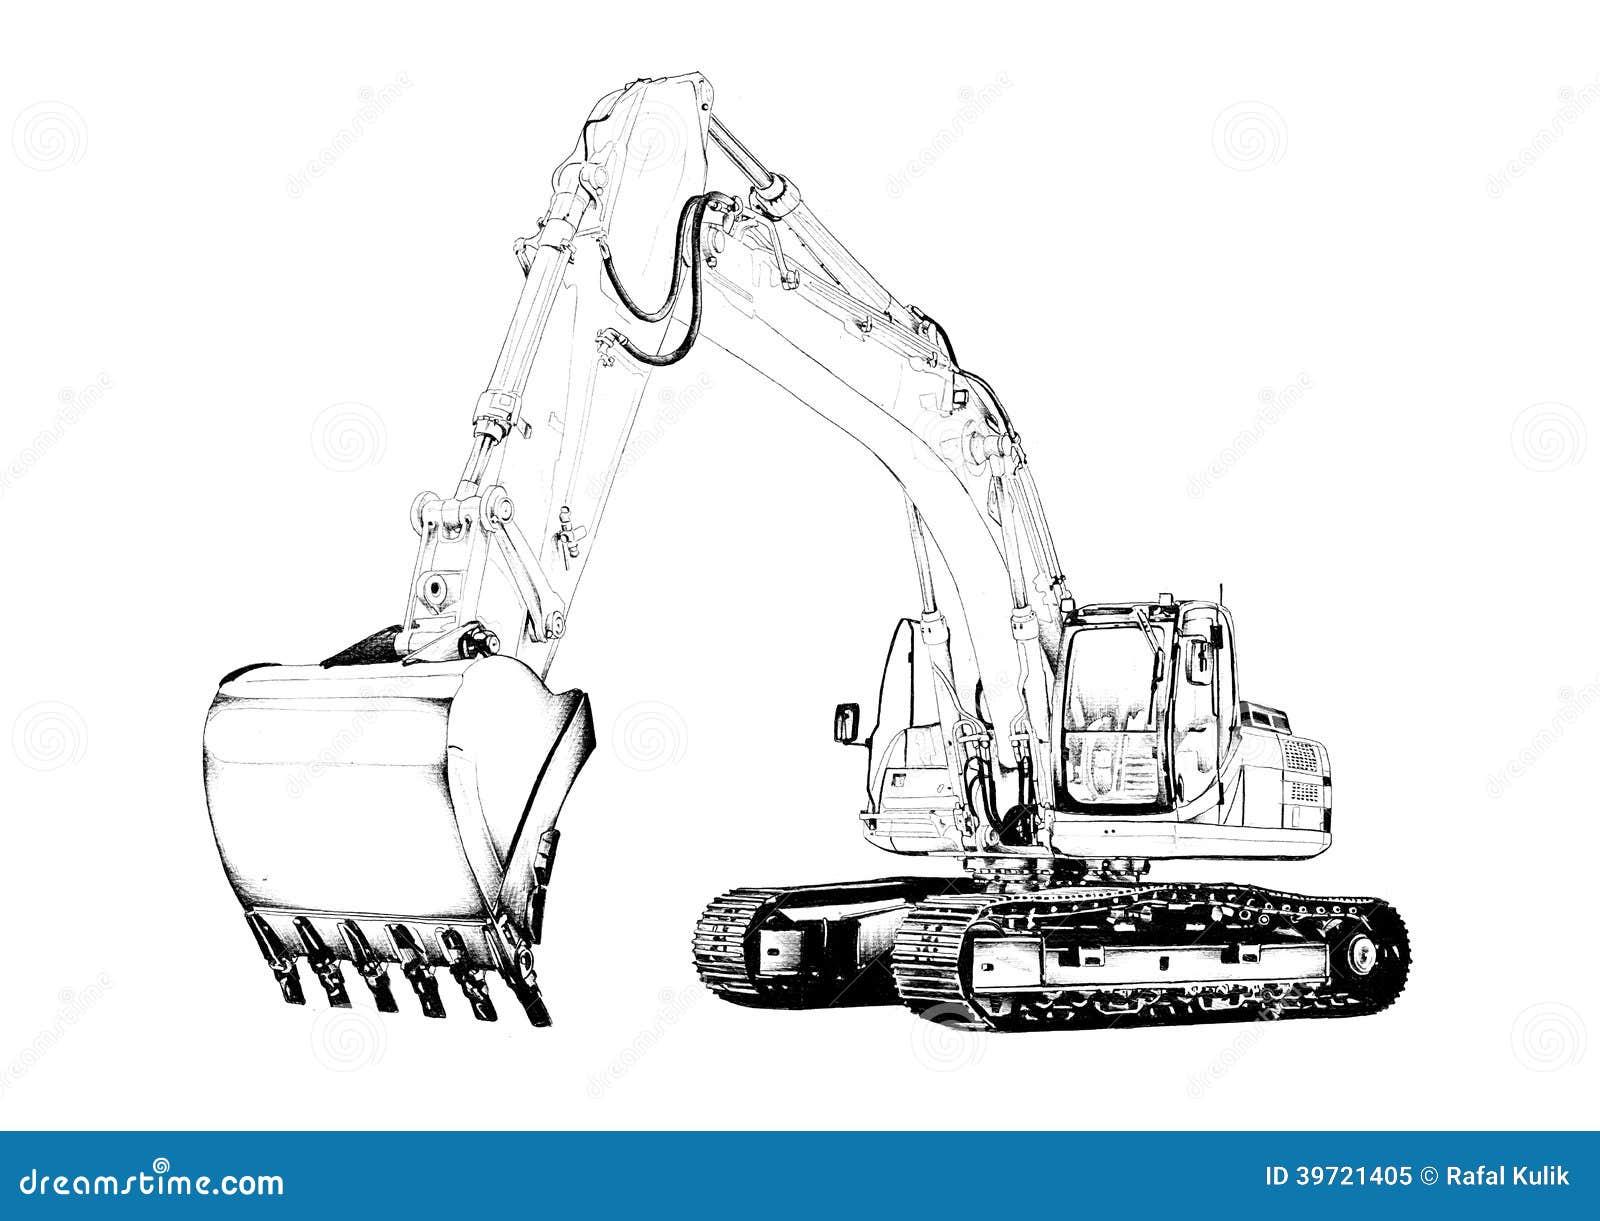 Excavator Illustration Isolated Art Drawing Stock Illustration - Image: 39721405